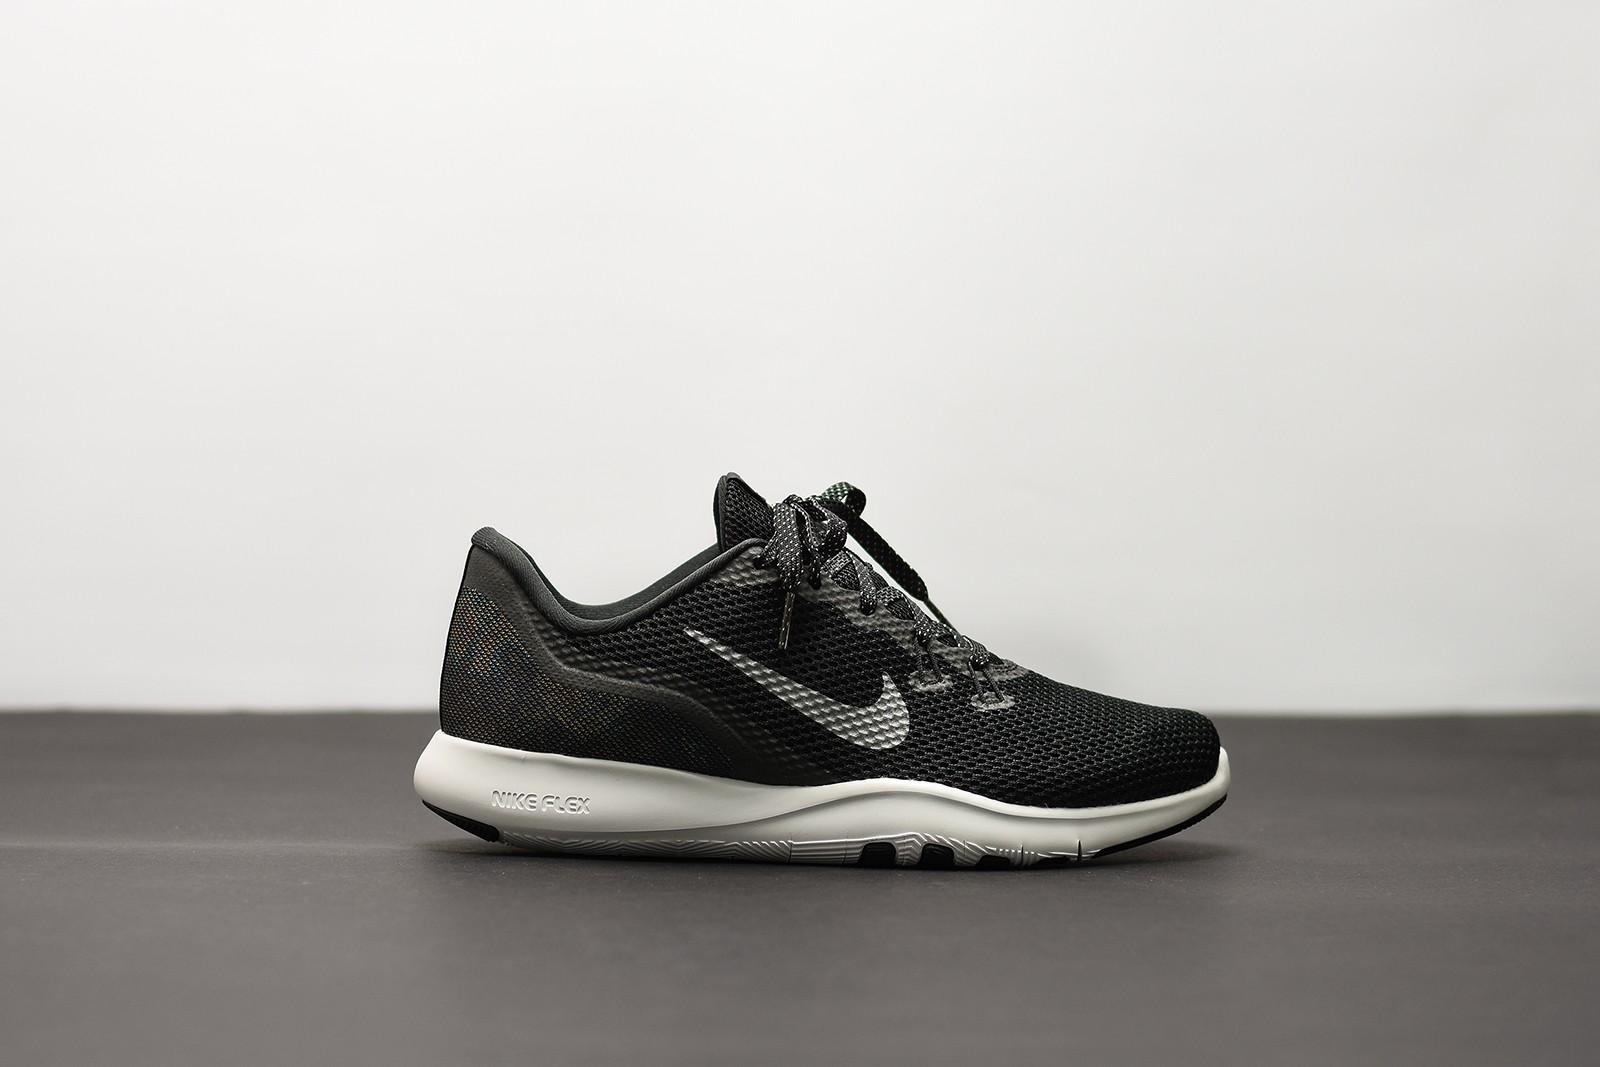 Dámská fitness obuv Nike W FLEX TRAINER 7 MTLC  29e8a81503b